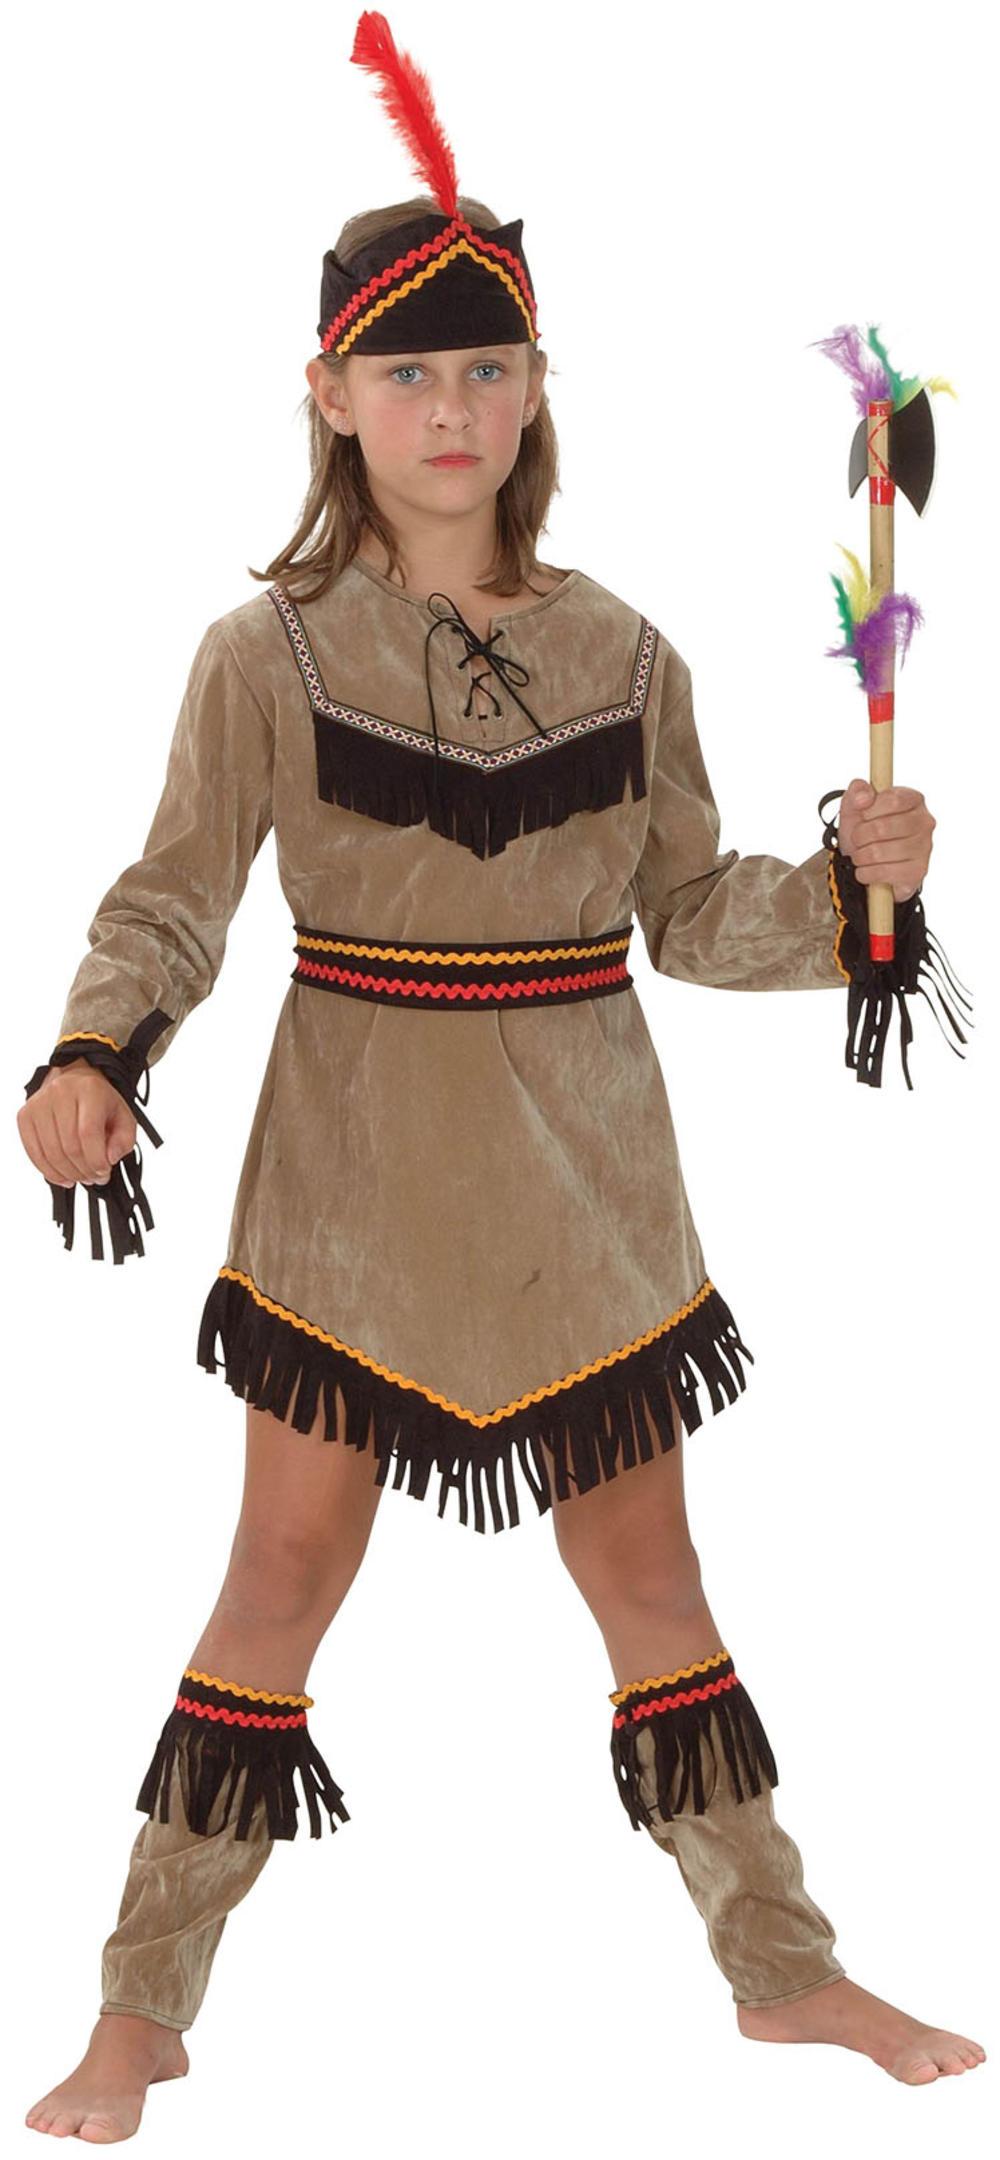 Deluxe Indian Girl Kids Fancy Dress Girls Pocahontas Western Childrens Costume